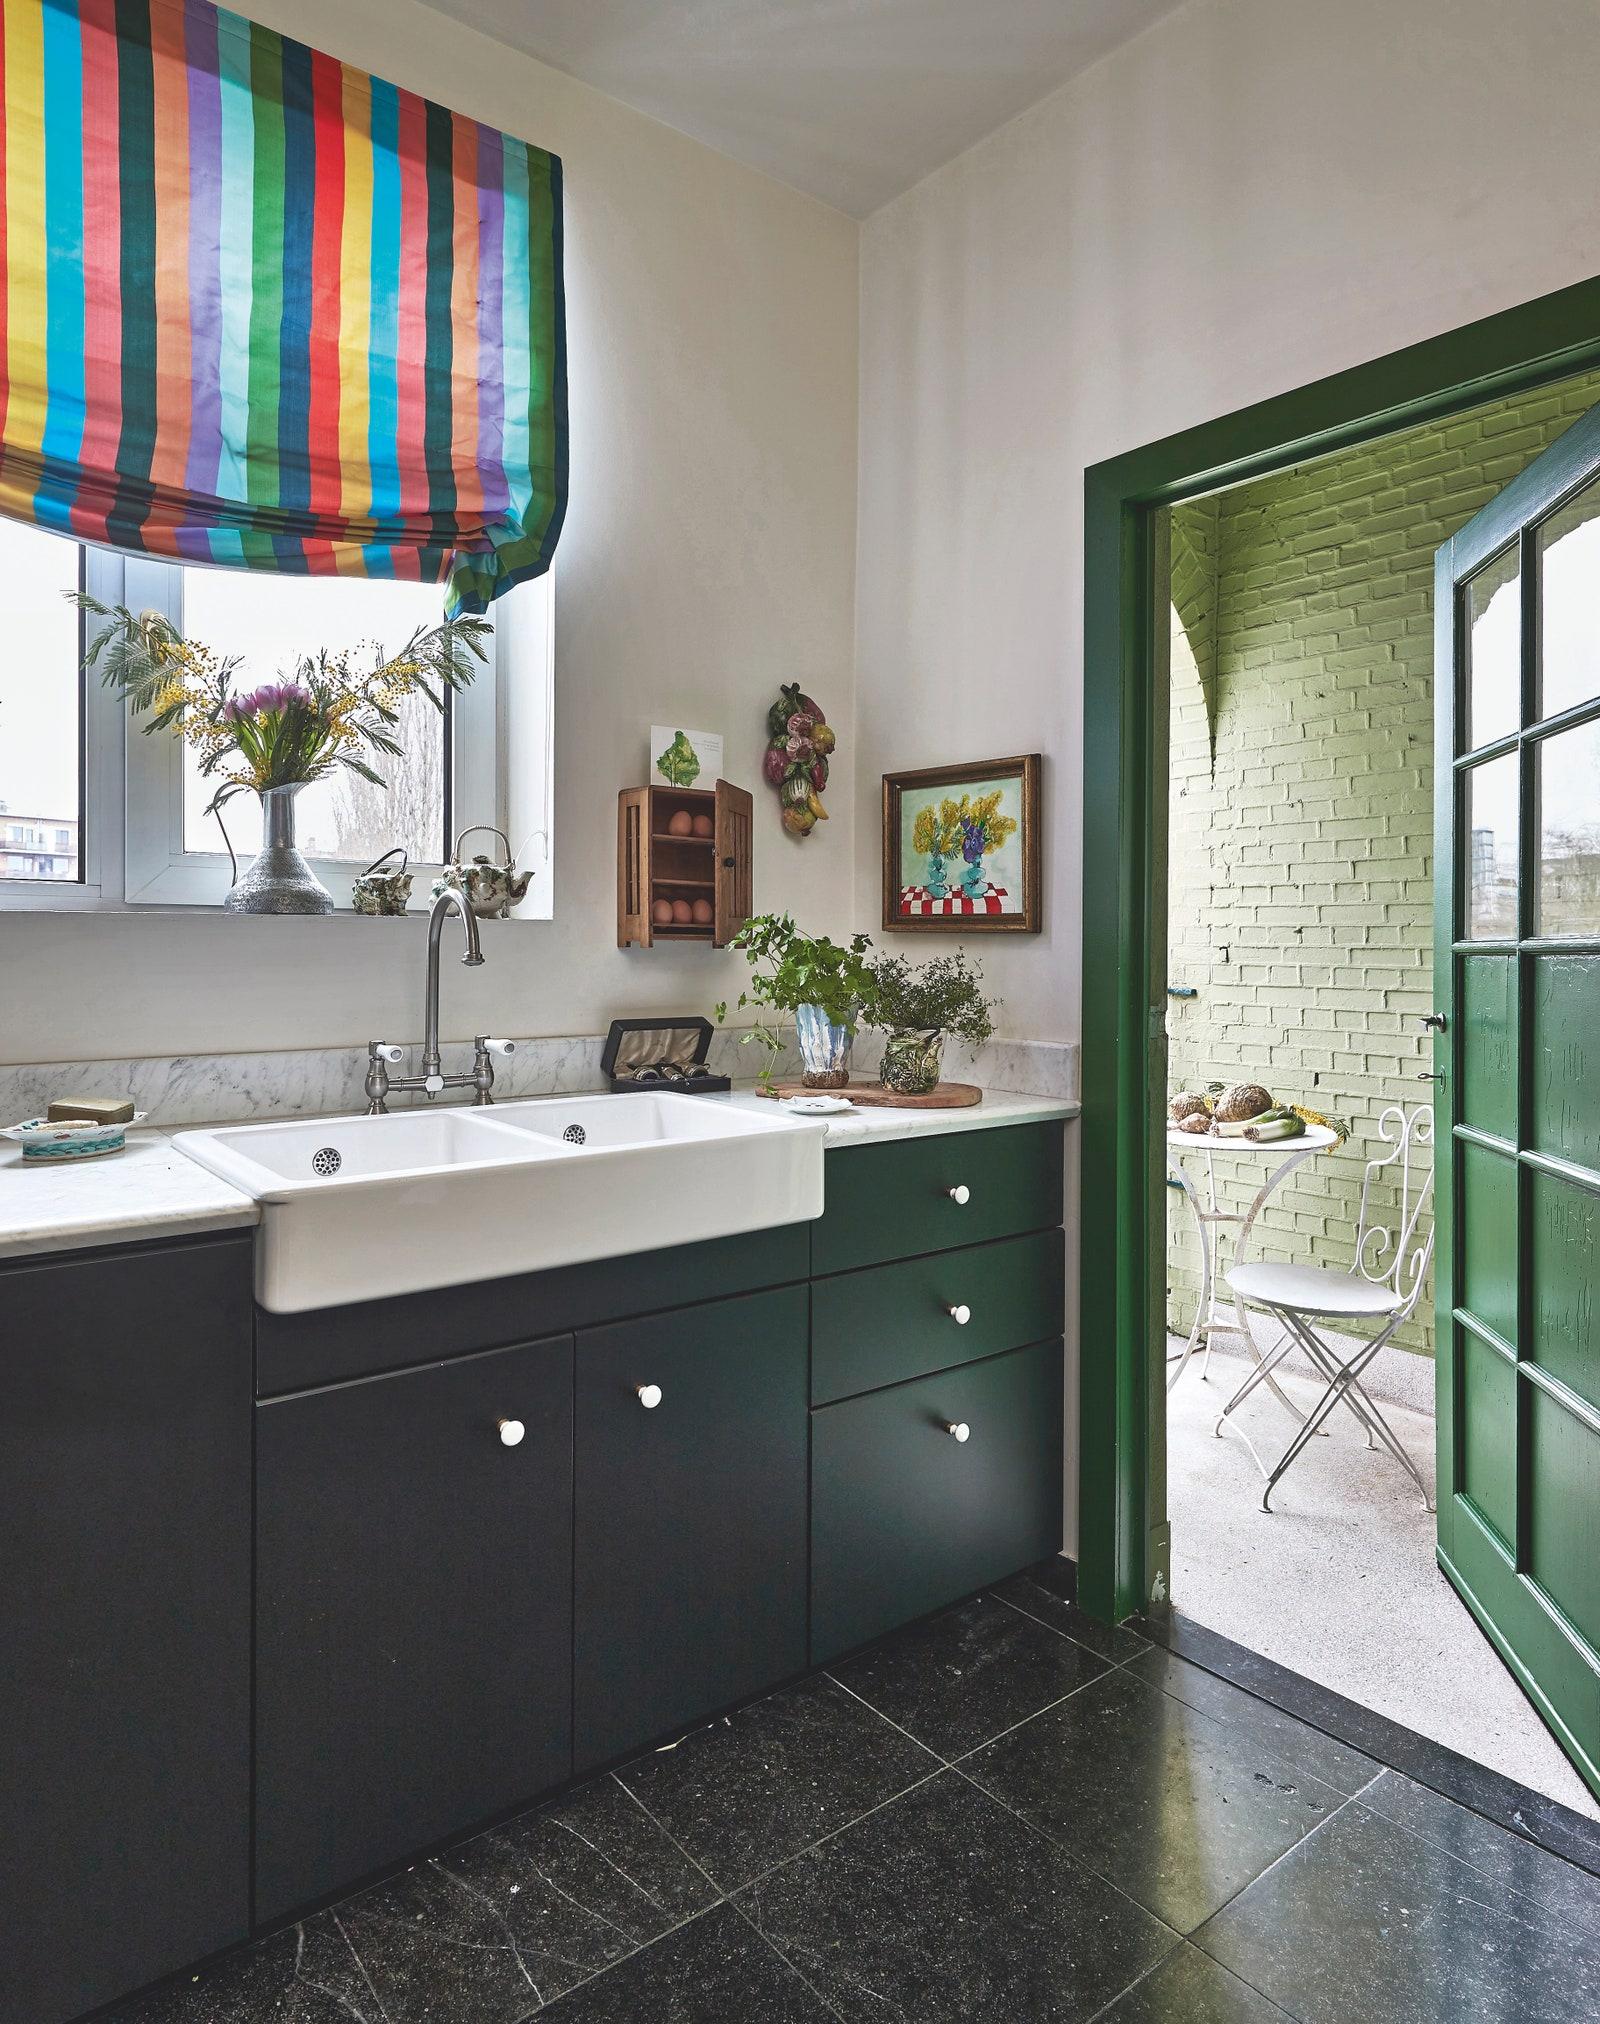 Dapur hijau rumah dengan tirai berwarna dan pintu hijau terbuka menunjukkan balkon yang bersebelahan.